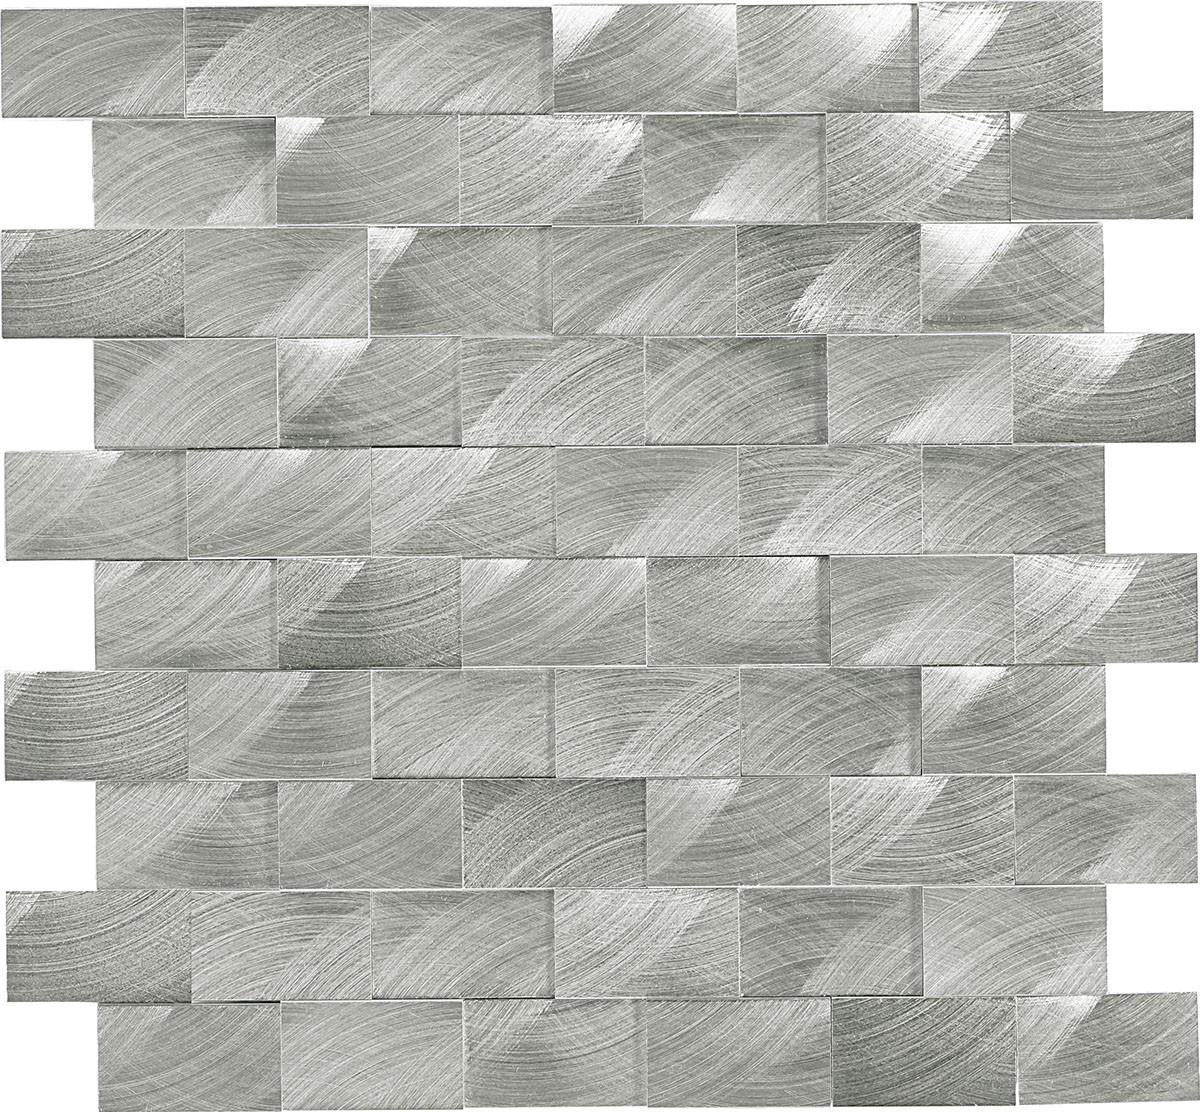 ST70 Steel Mosaic 3d brick joint